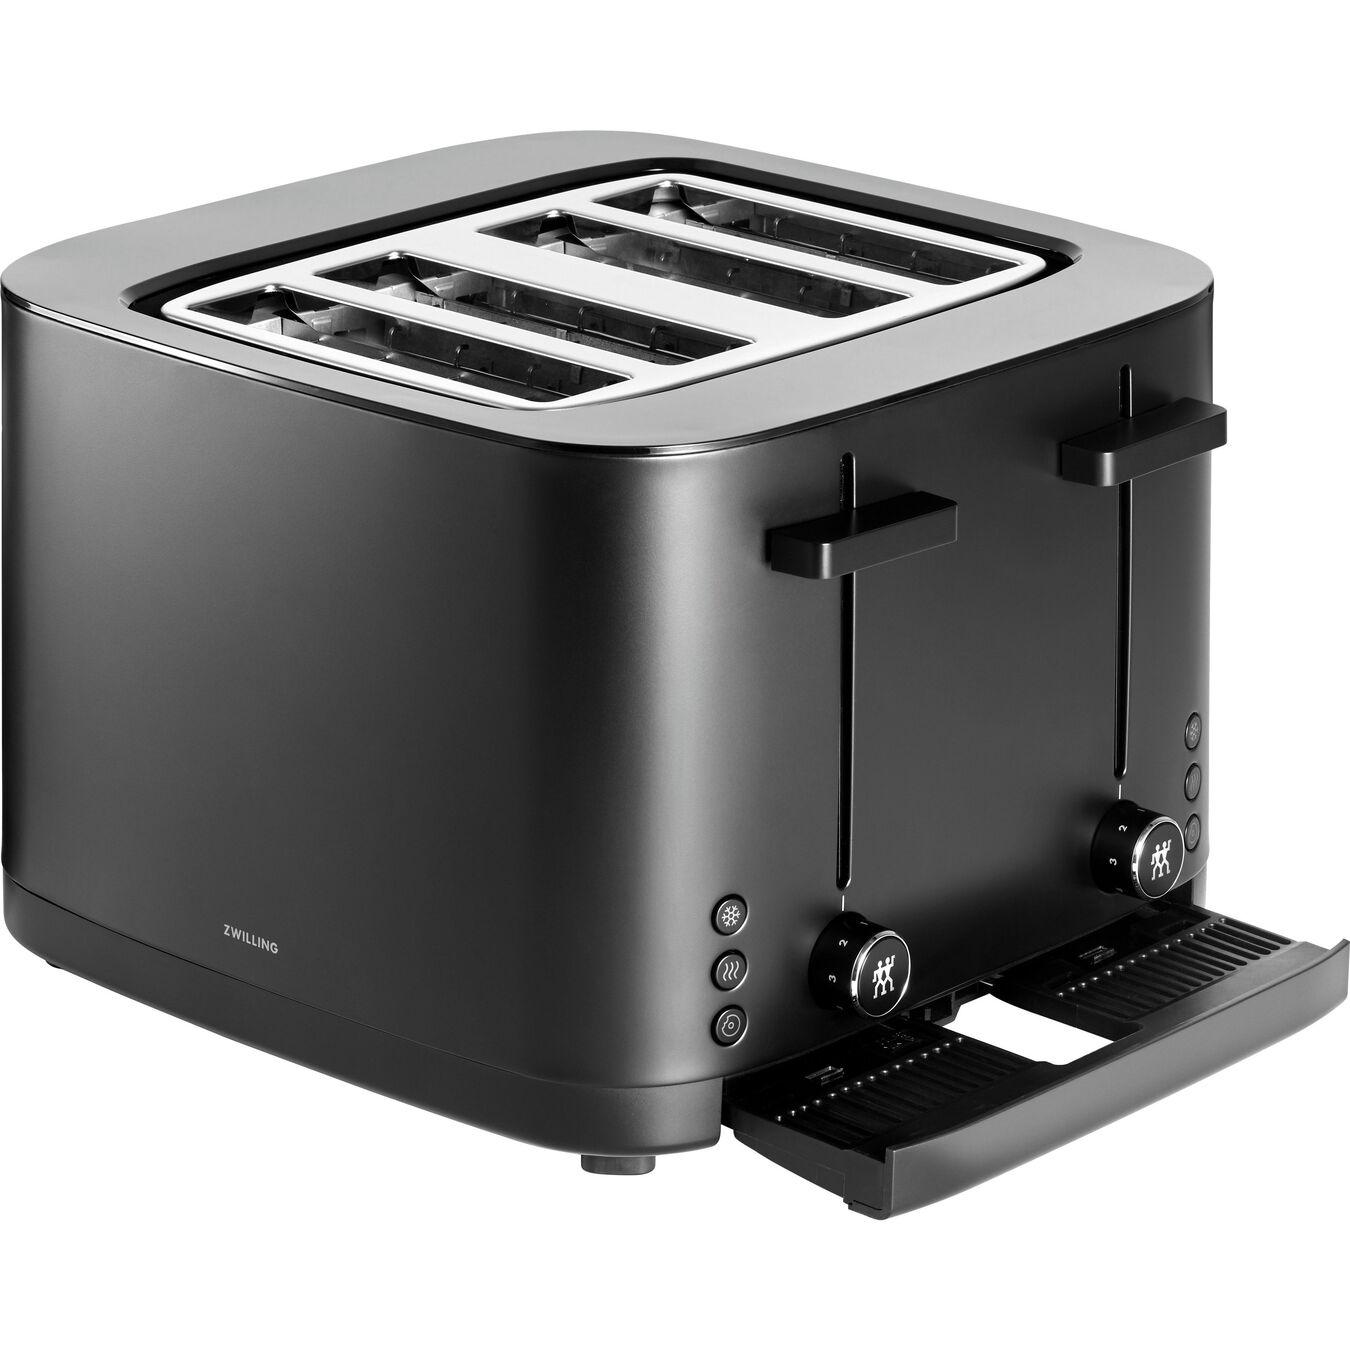 4 Slot Toaster - Black,,large 3